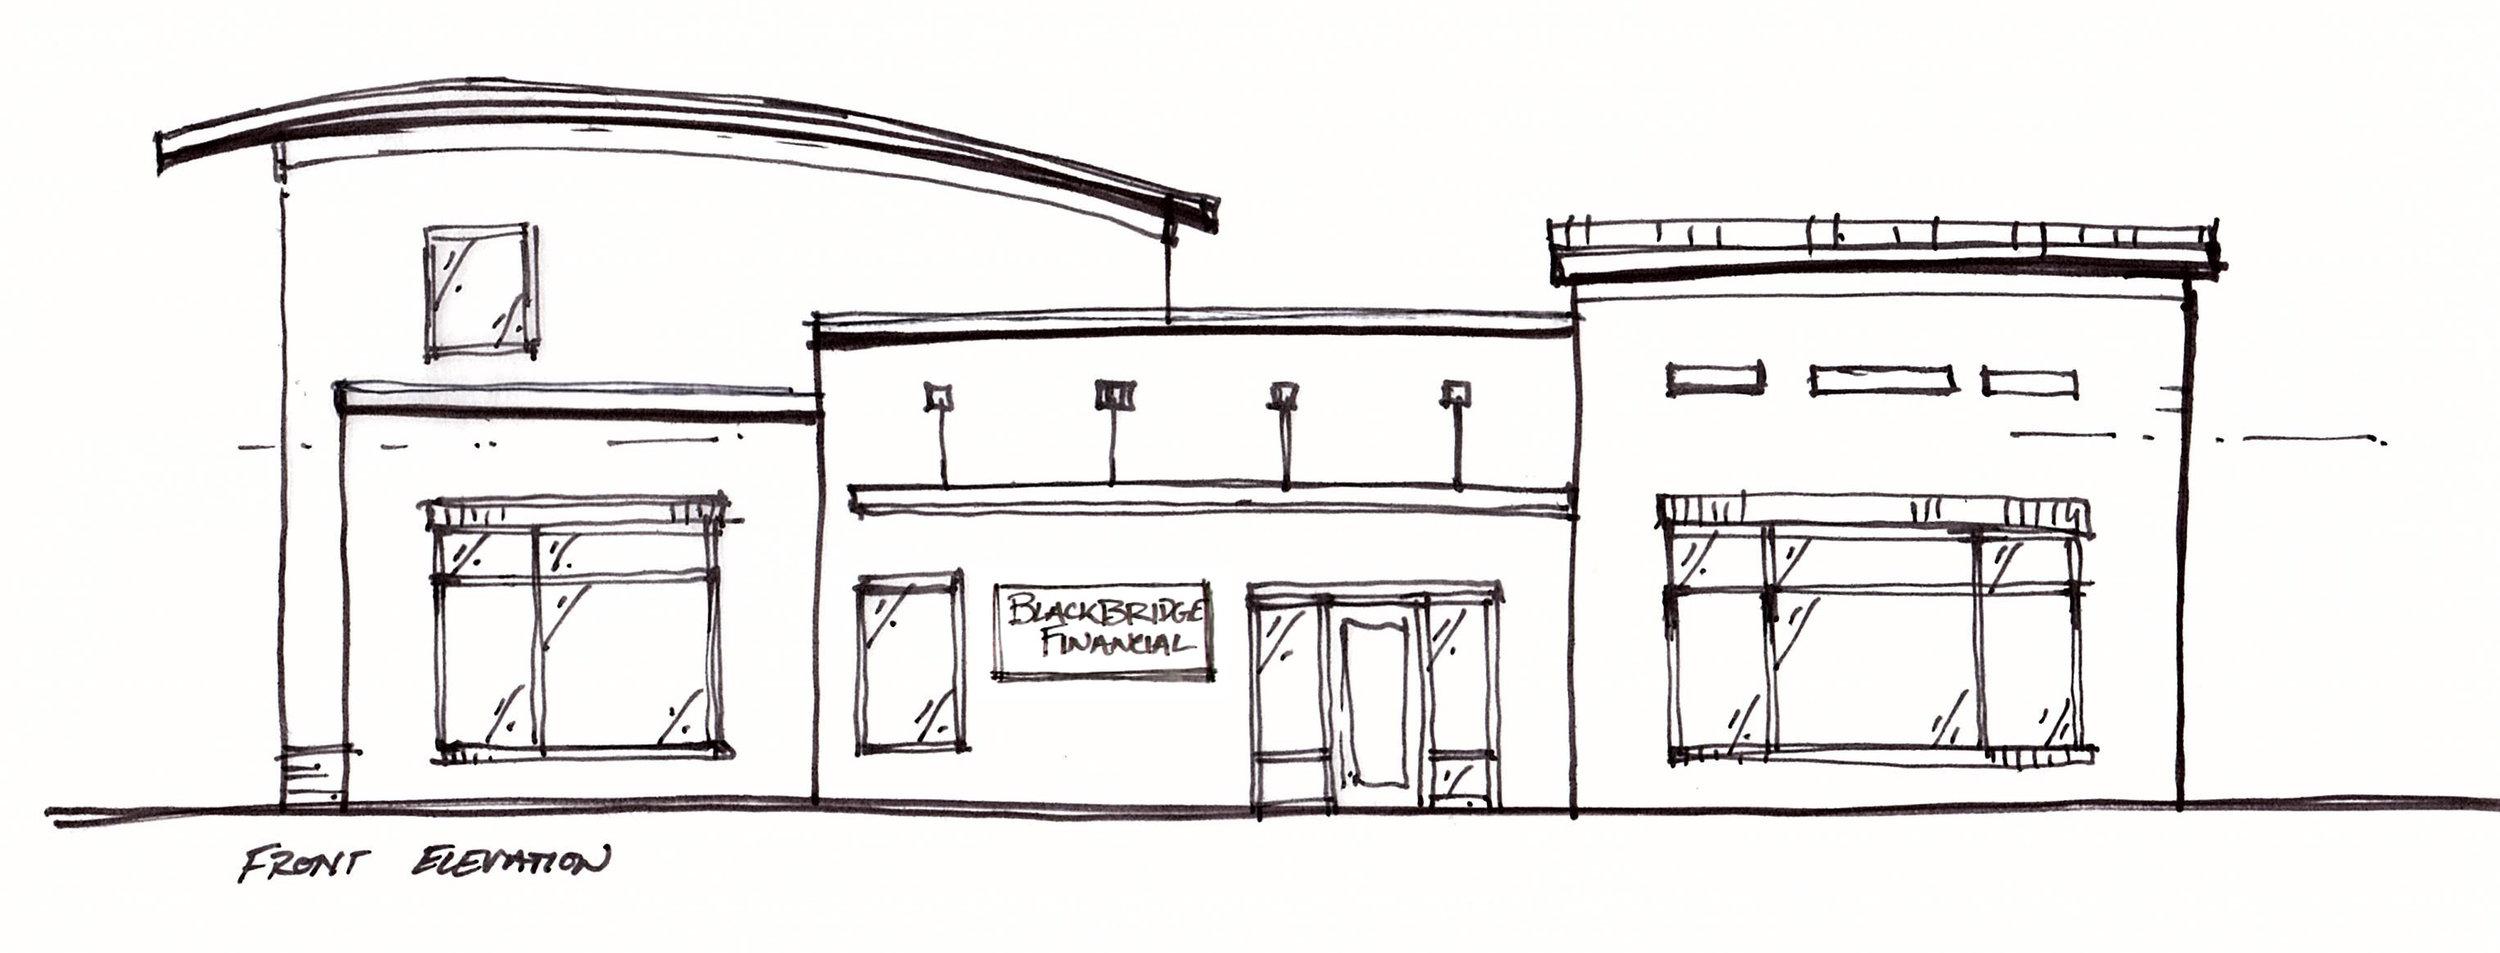 BlackbridgeFinancial_SketchElevation_Front_8_17_16.jpg